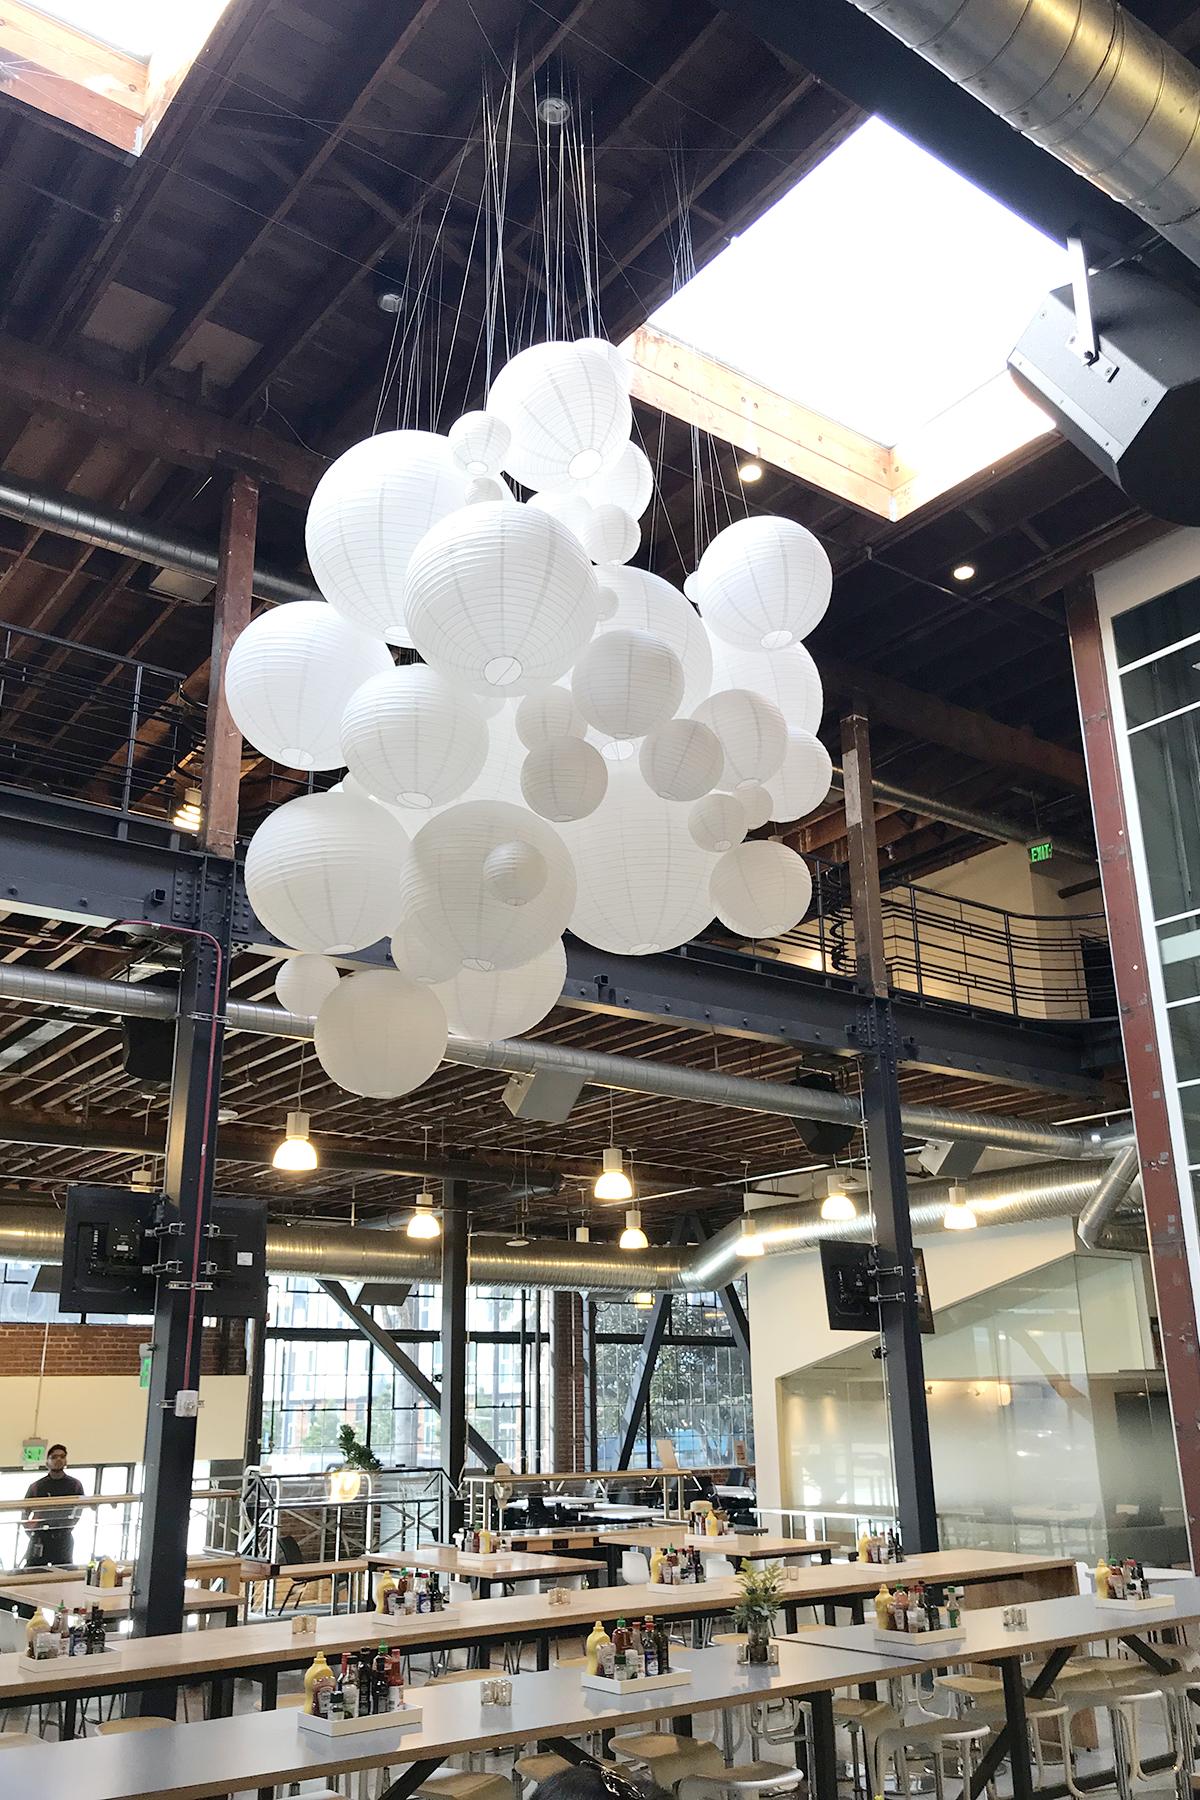 Tour of Pinterest in San Francisco #MyPinterest